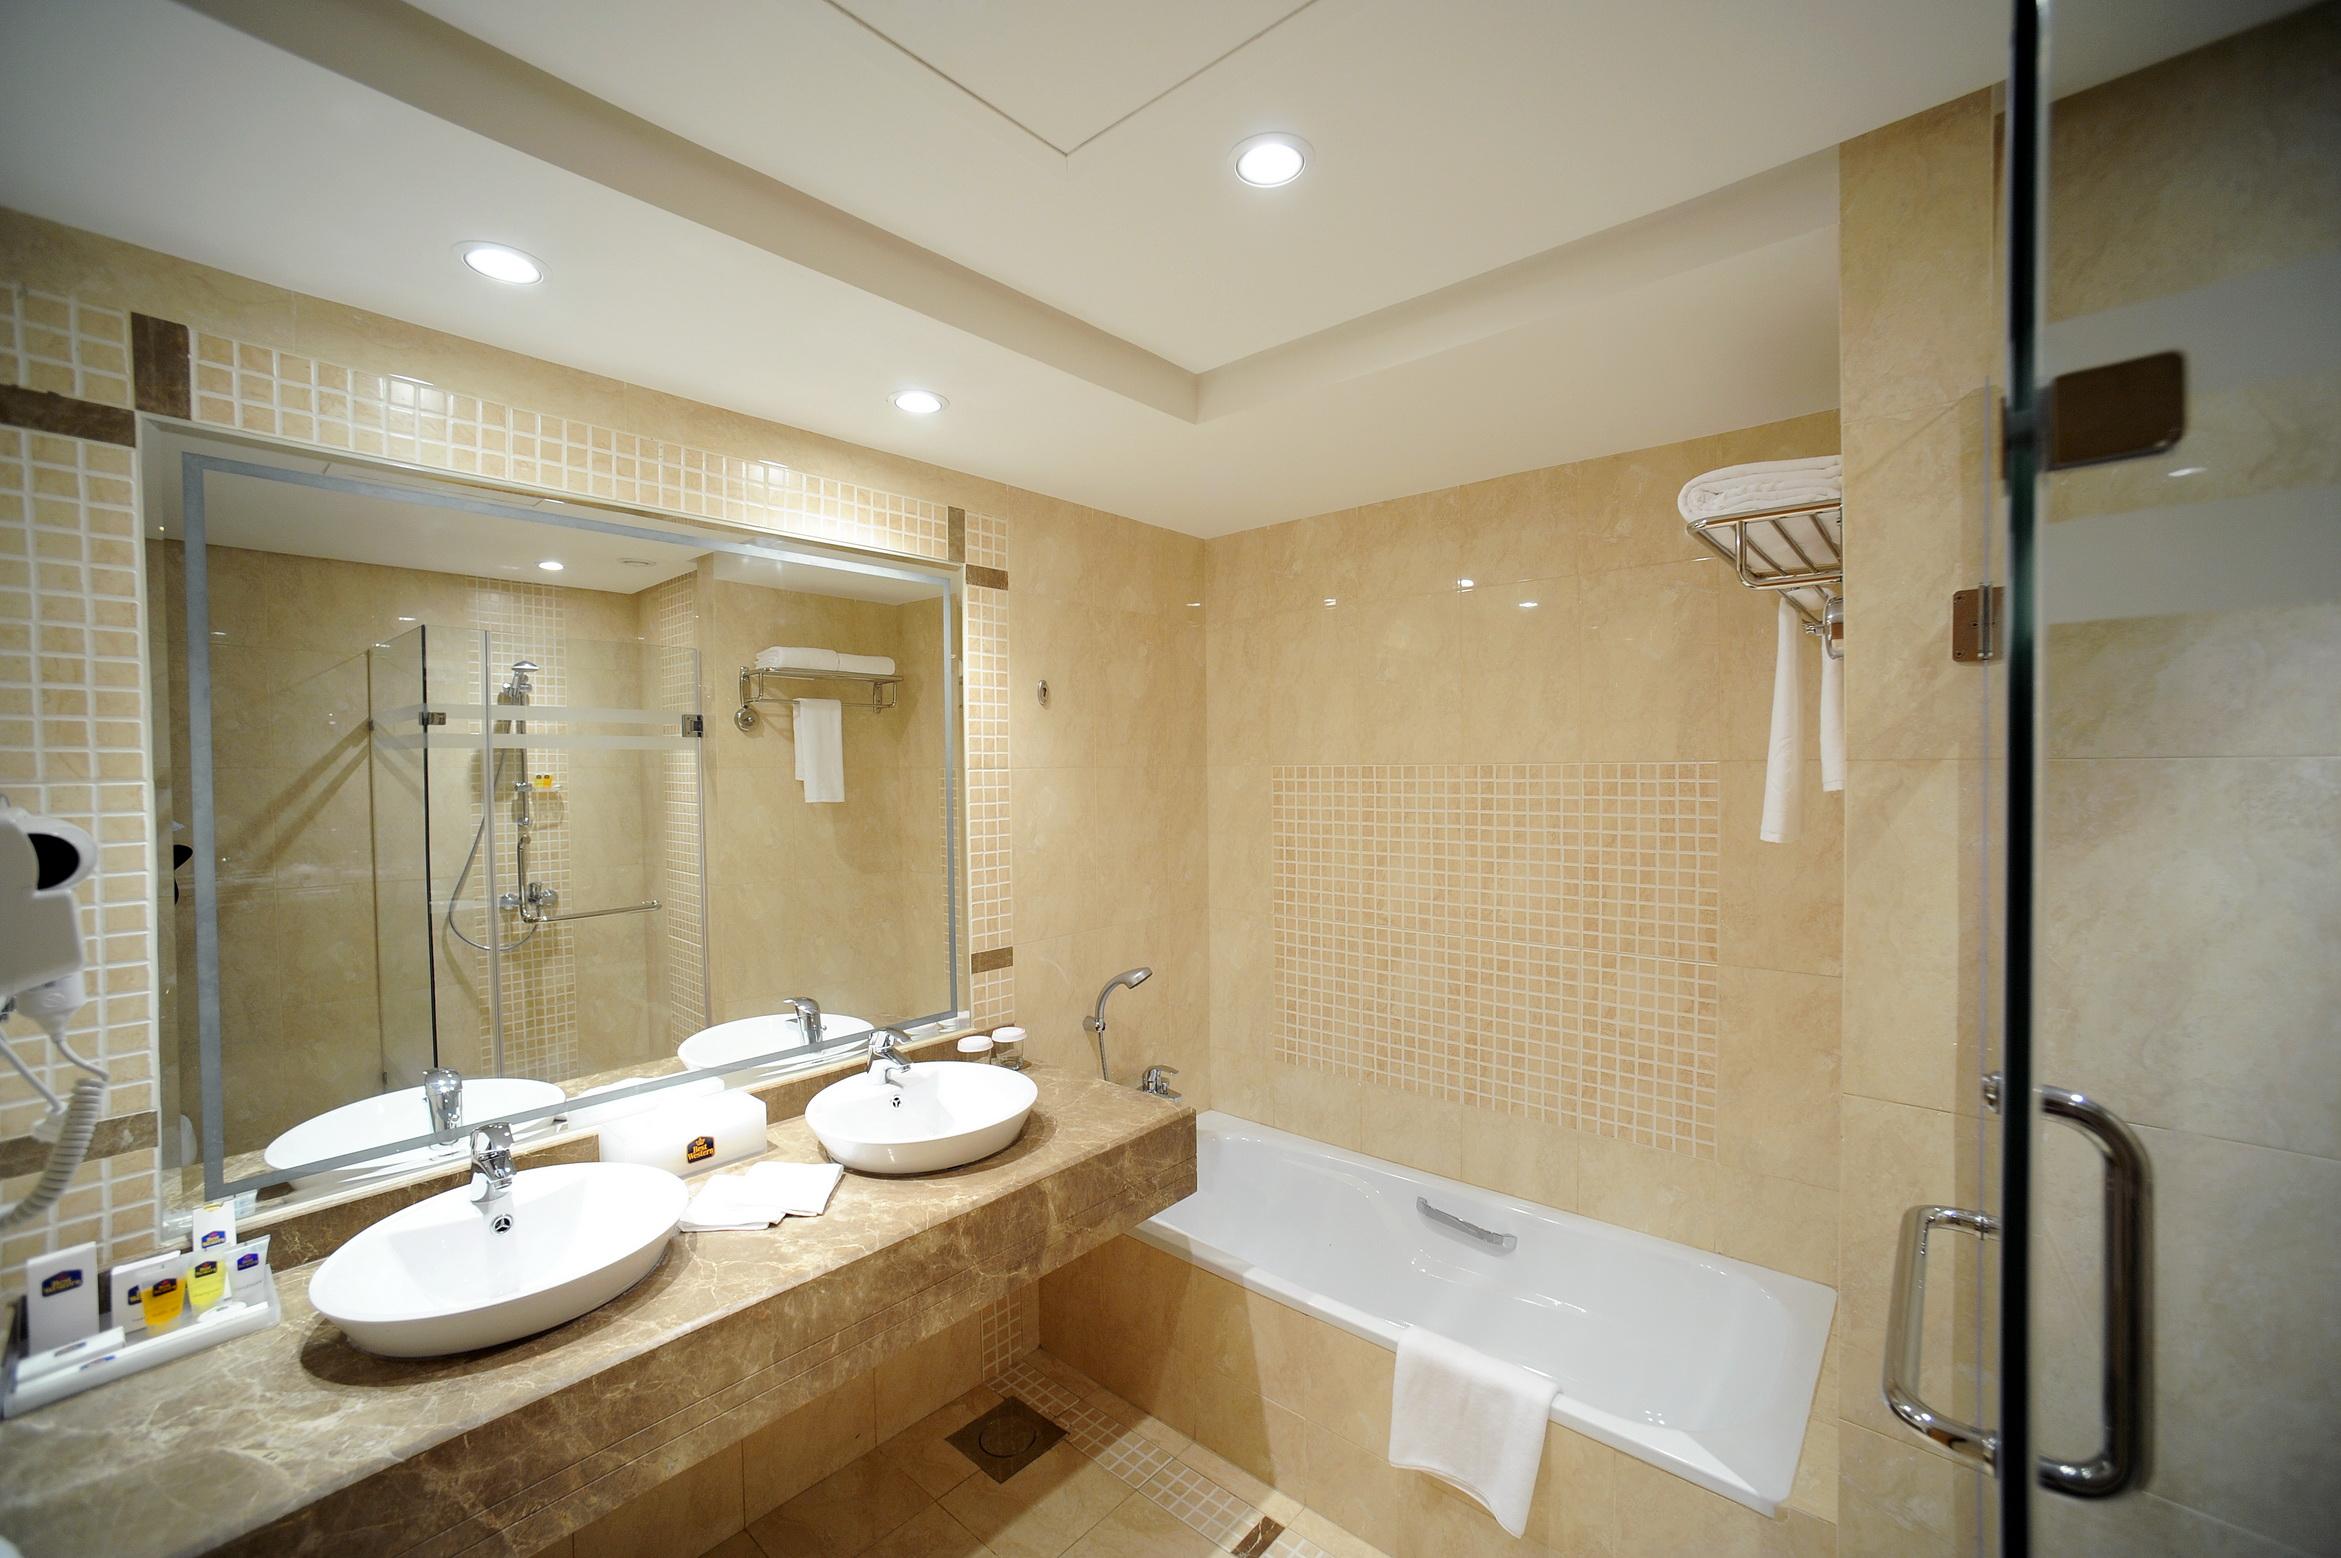 Best western international inc hospitality net for Best western bathrooms